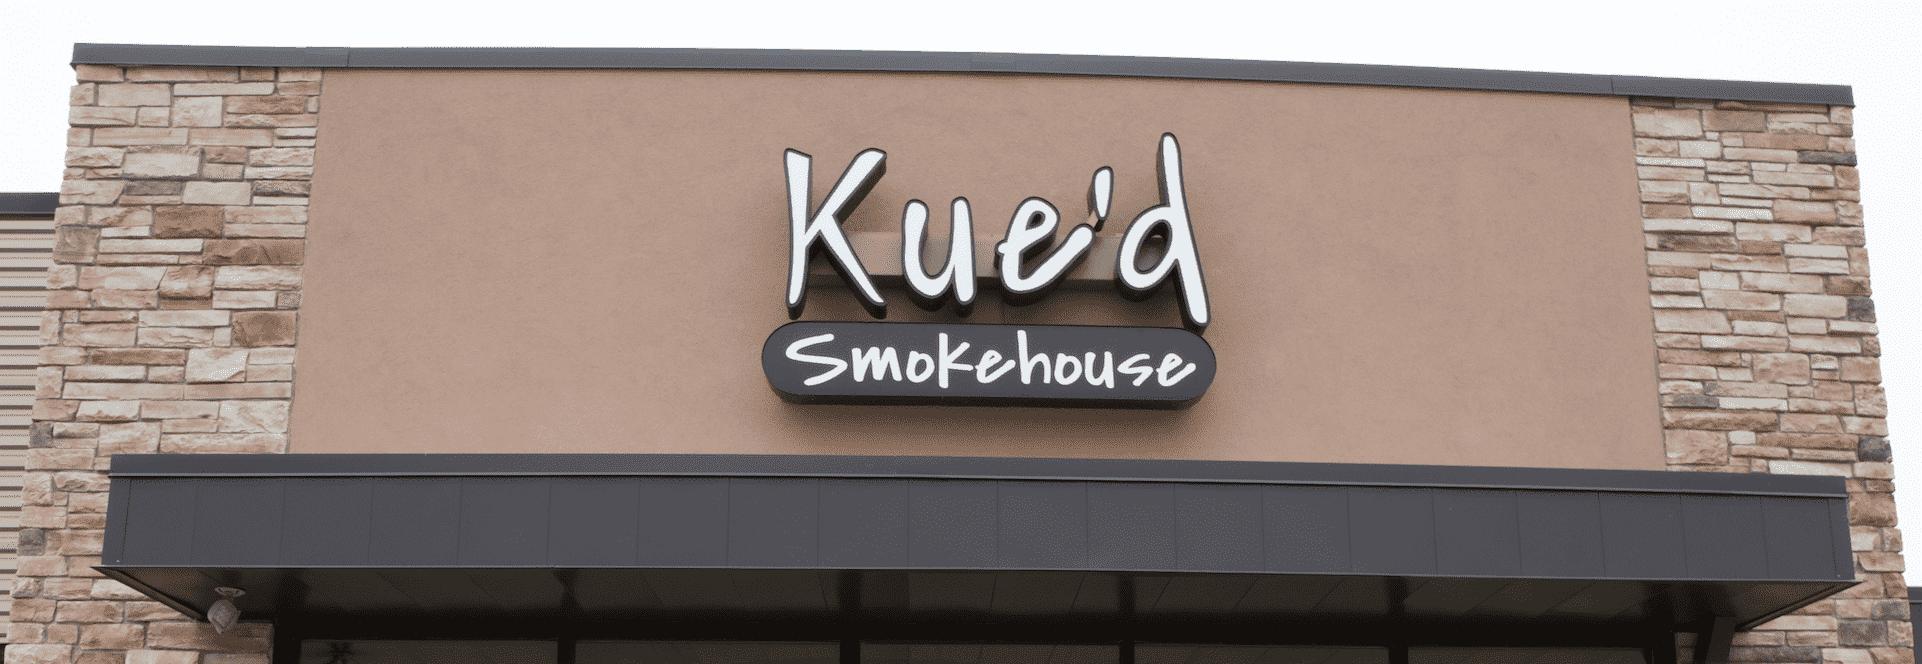 Kue'd Smokehouse Building